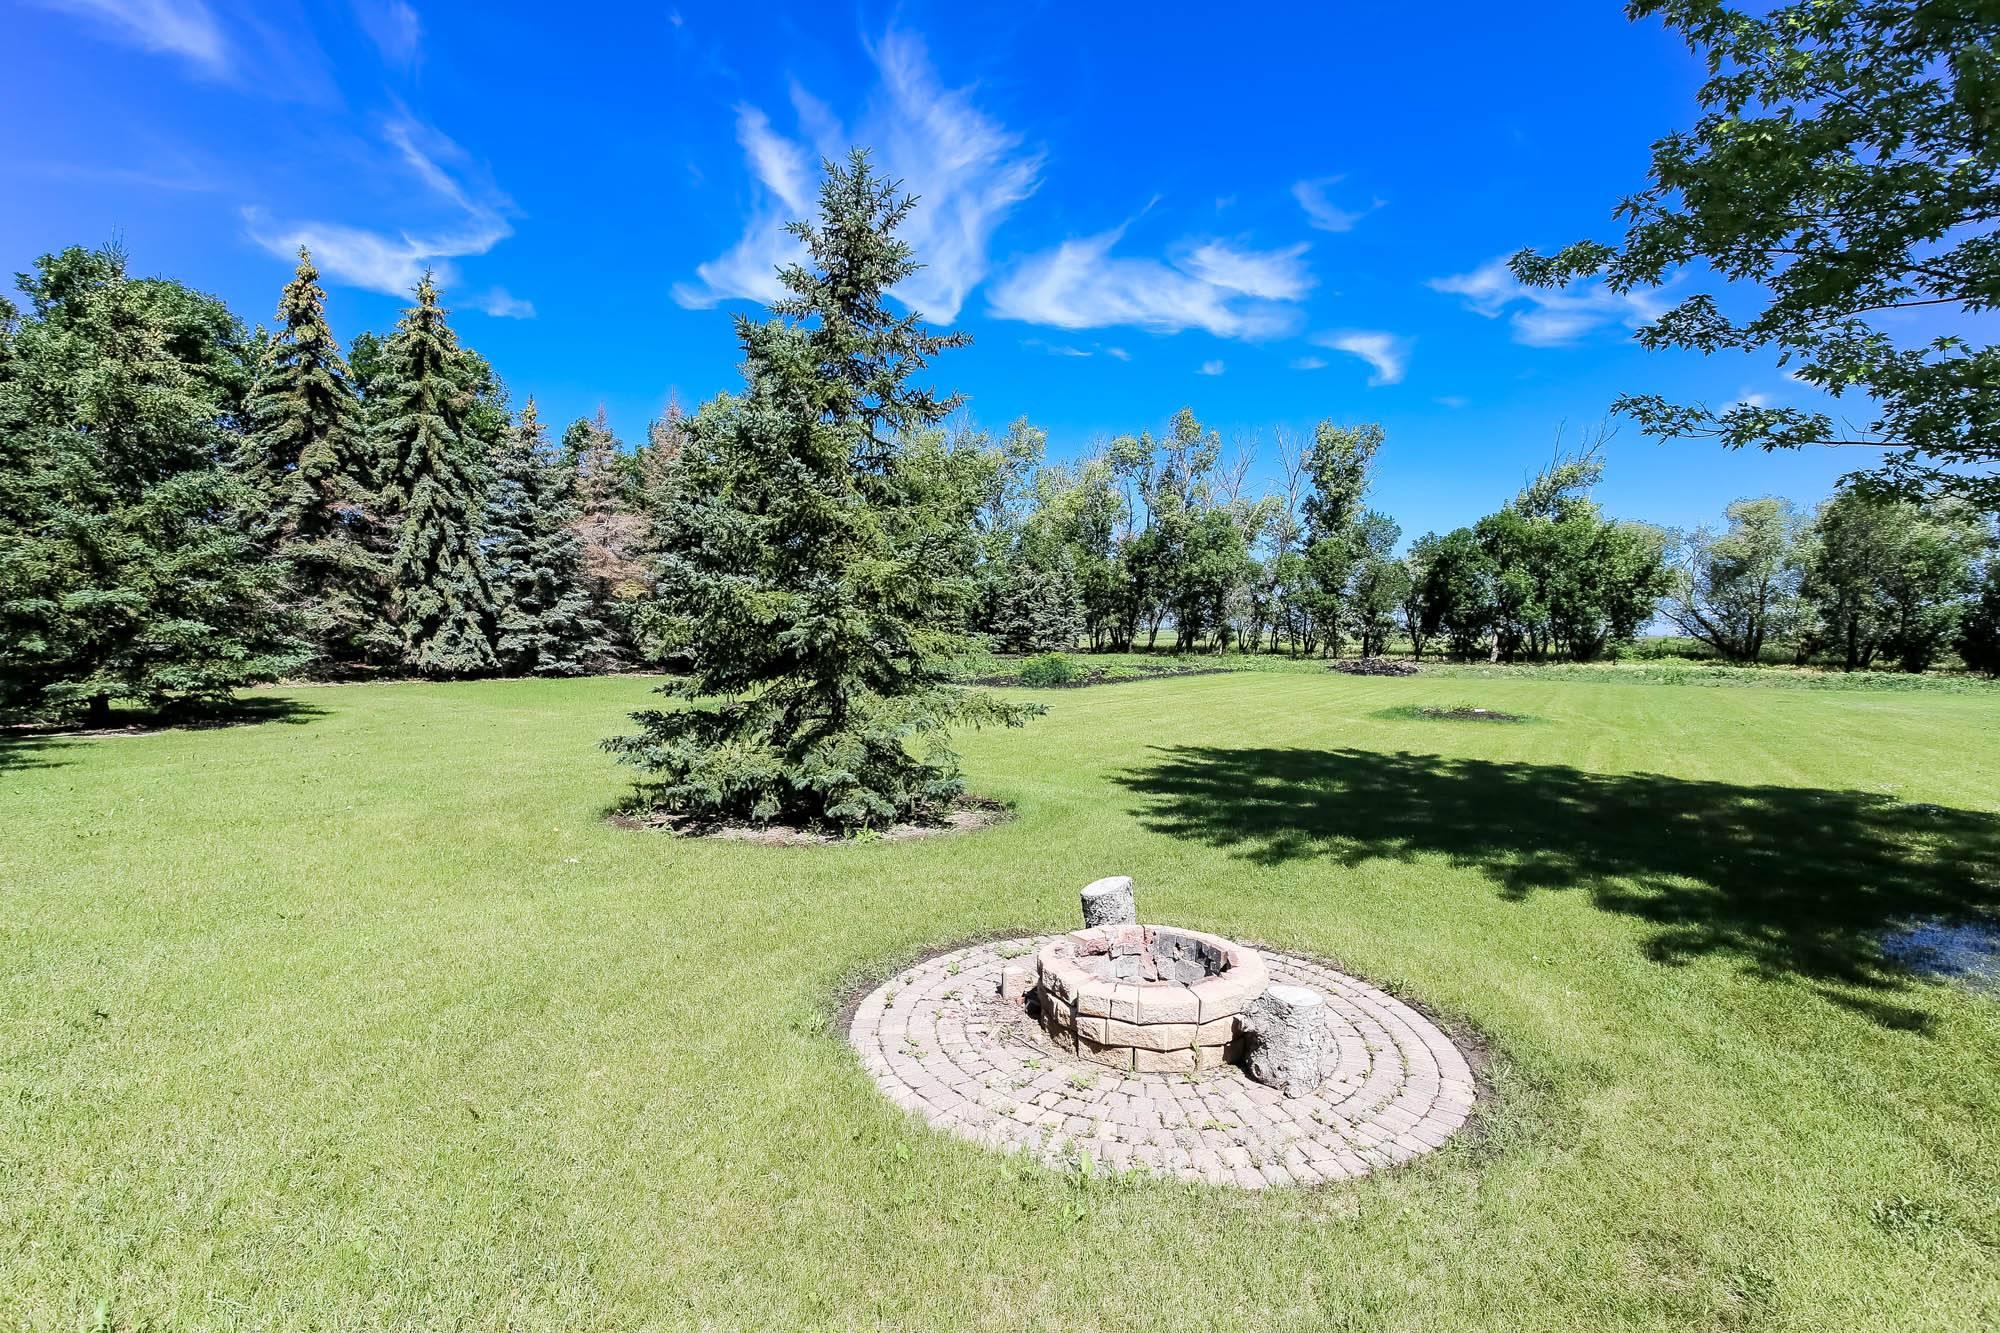 4155 La Verendrye Road, Winnipeg, Manitoba  R4G 0S7 - Photo 32 - 1919439